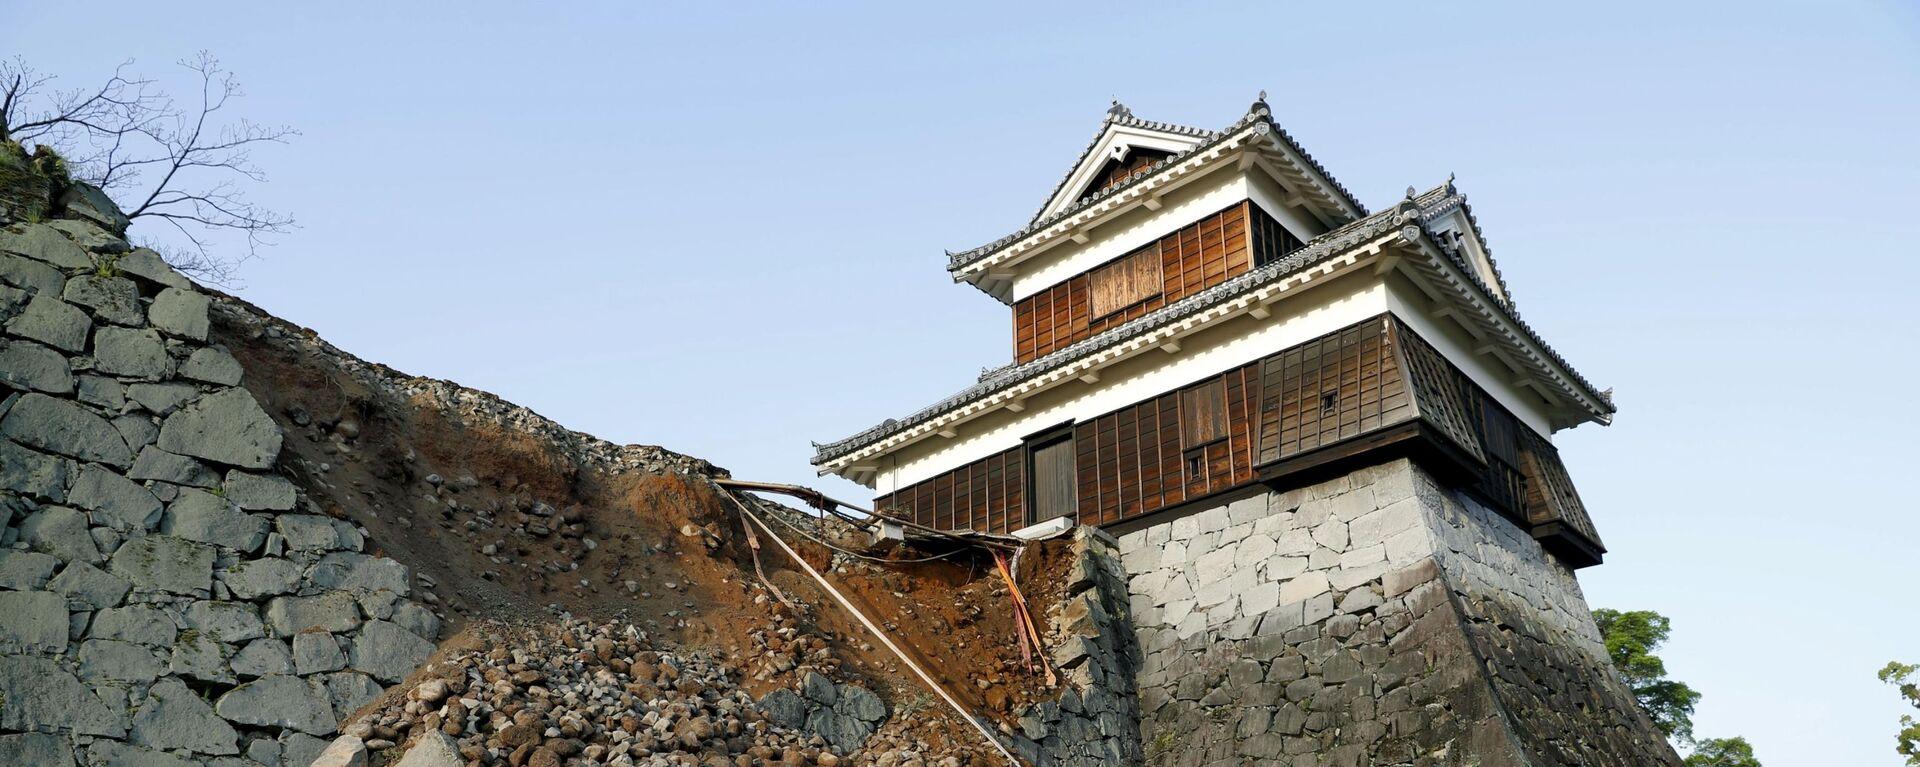 Пострадавшая от землетрясение стена замка в городе Кумамото в Японии - Sputnik Latvija, 1920, 22.11.2016